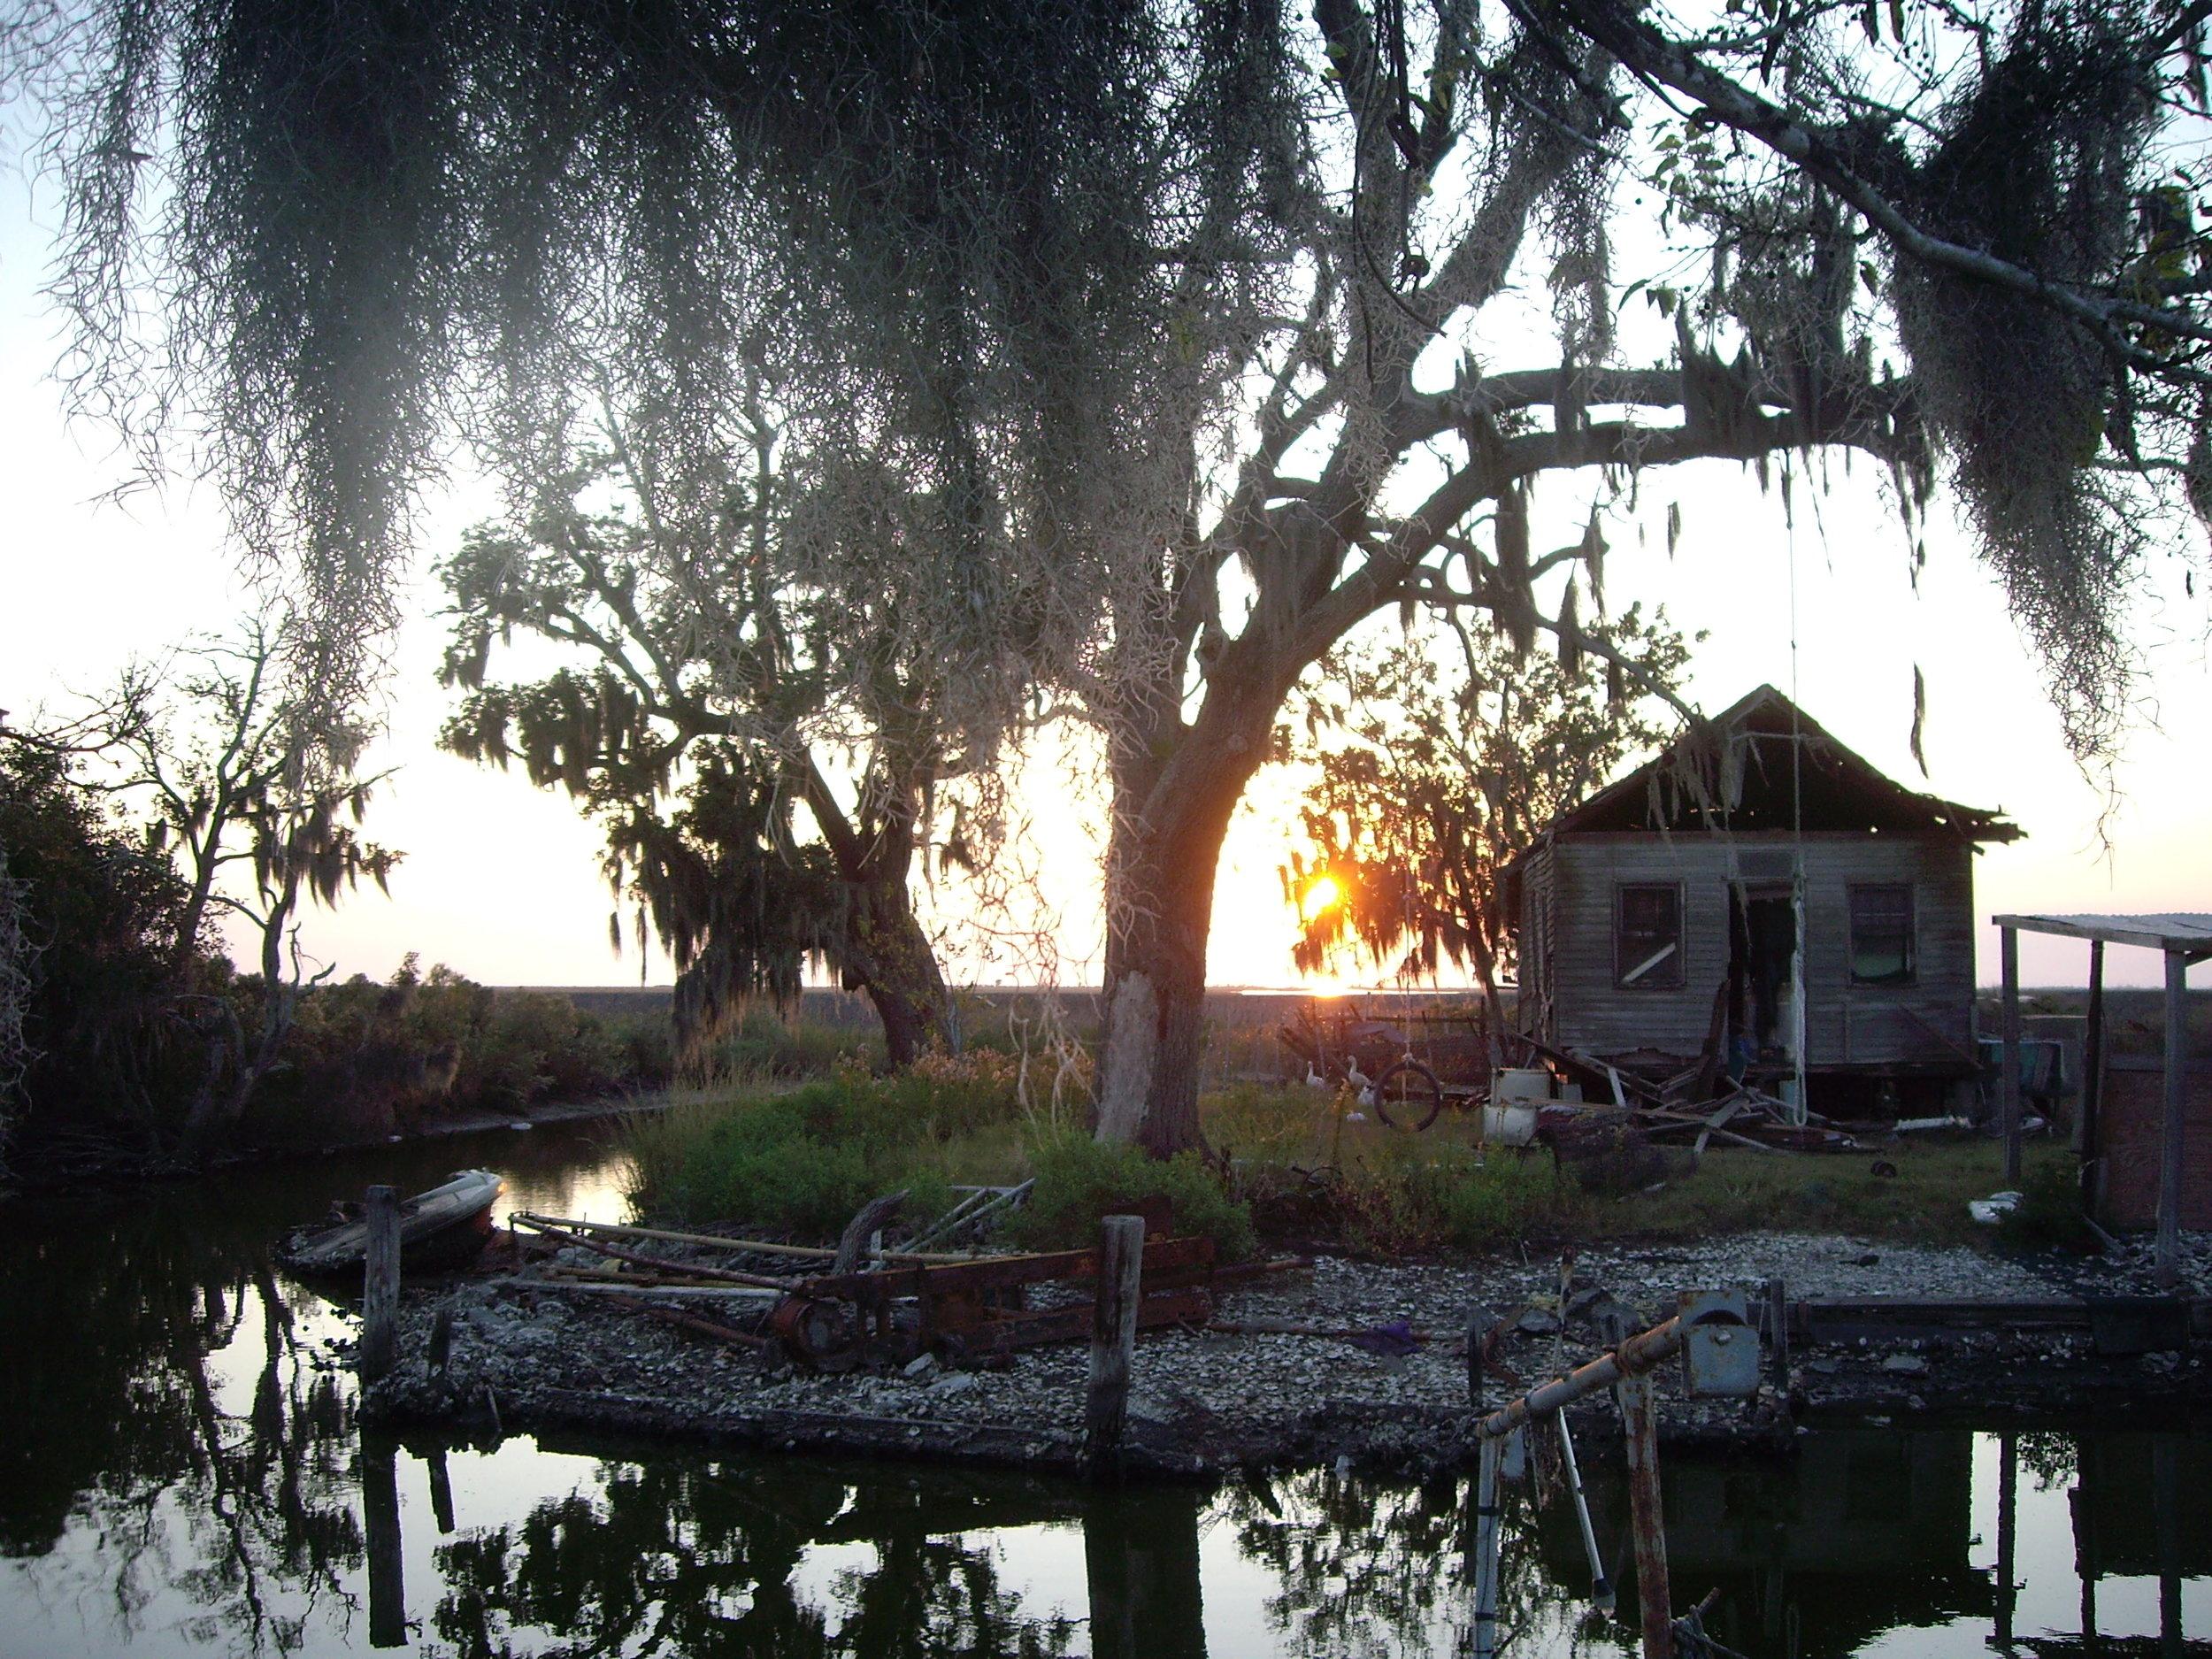 louisiana bayou.jpg